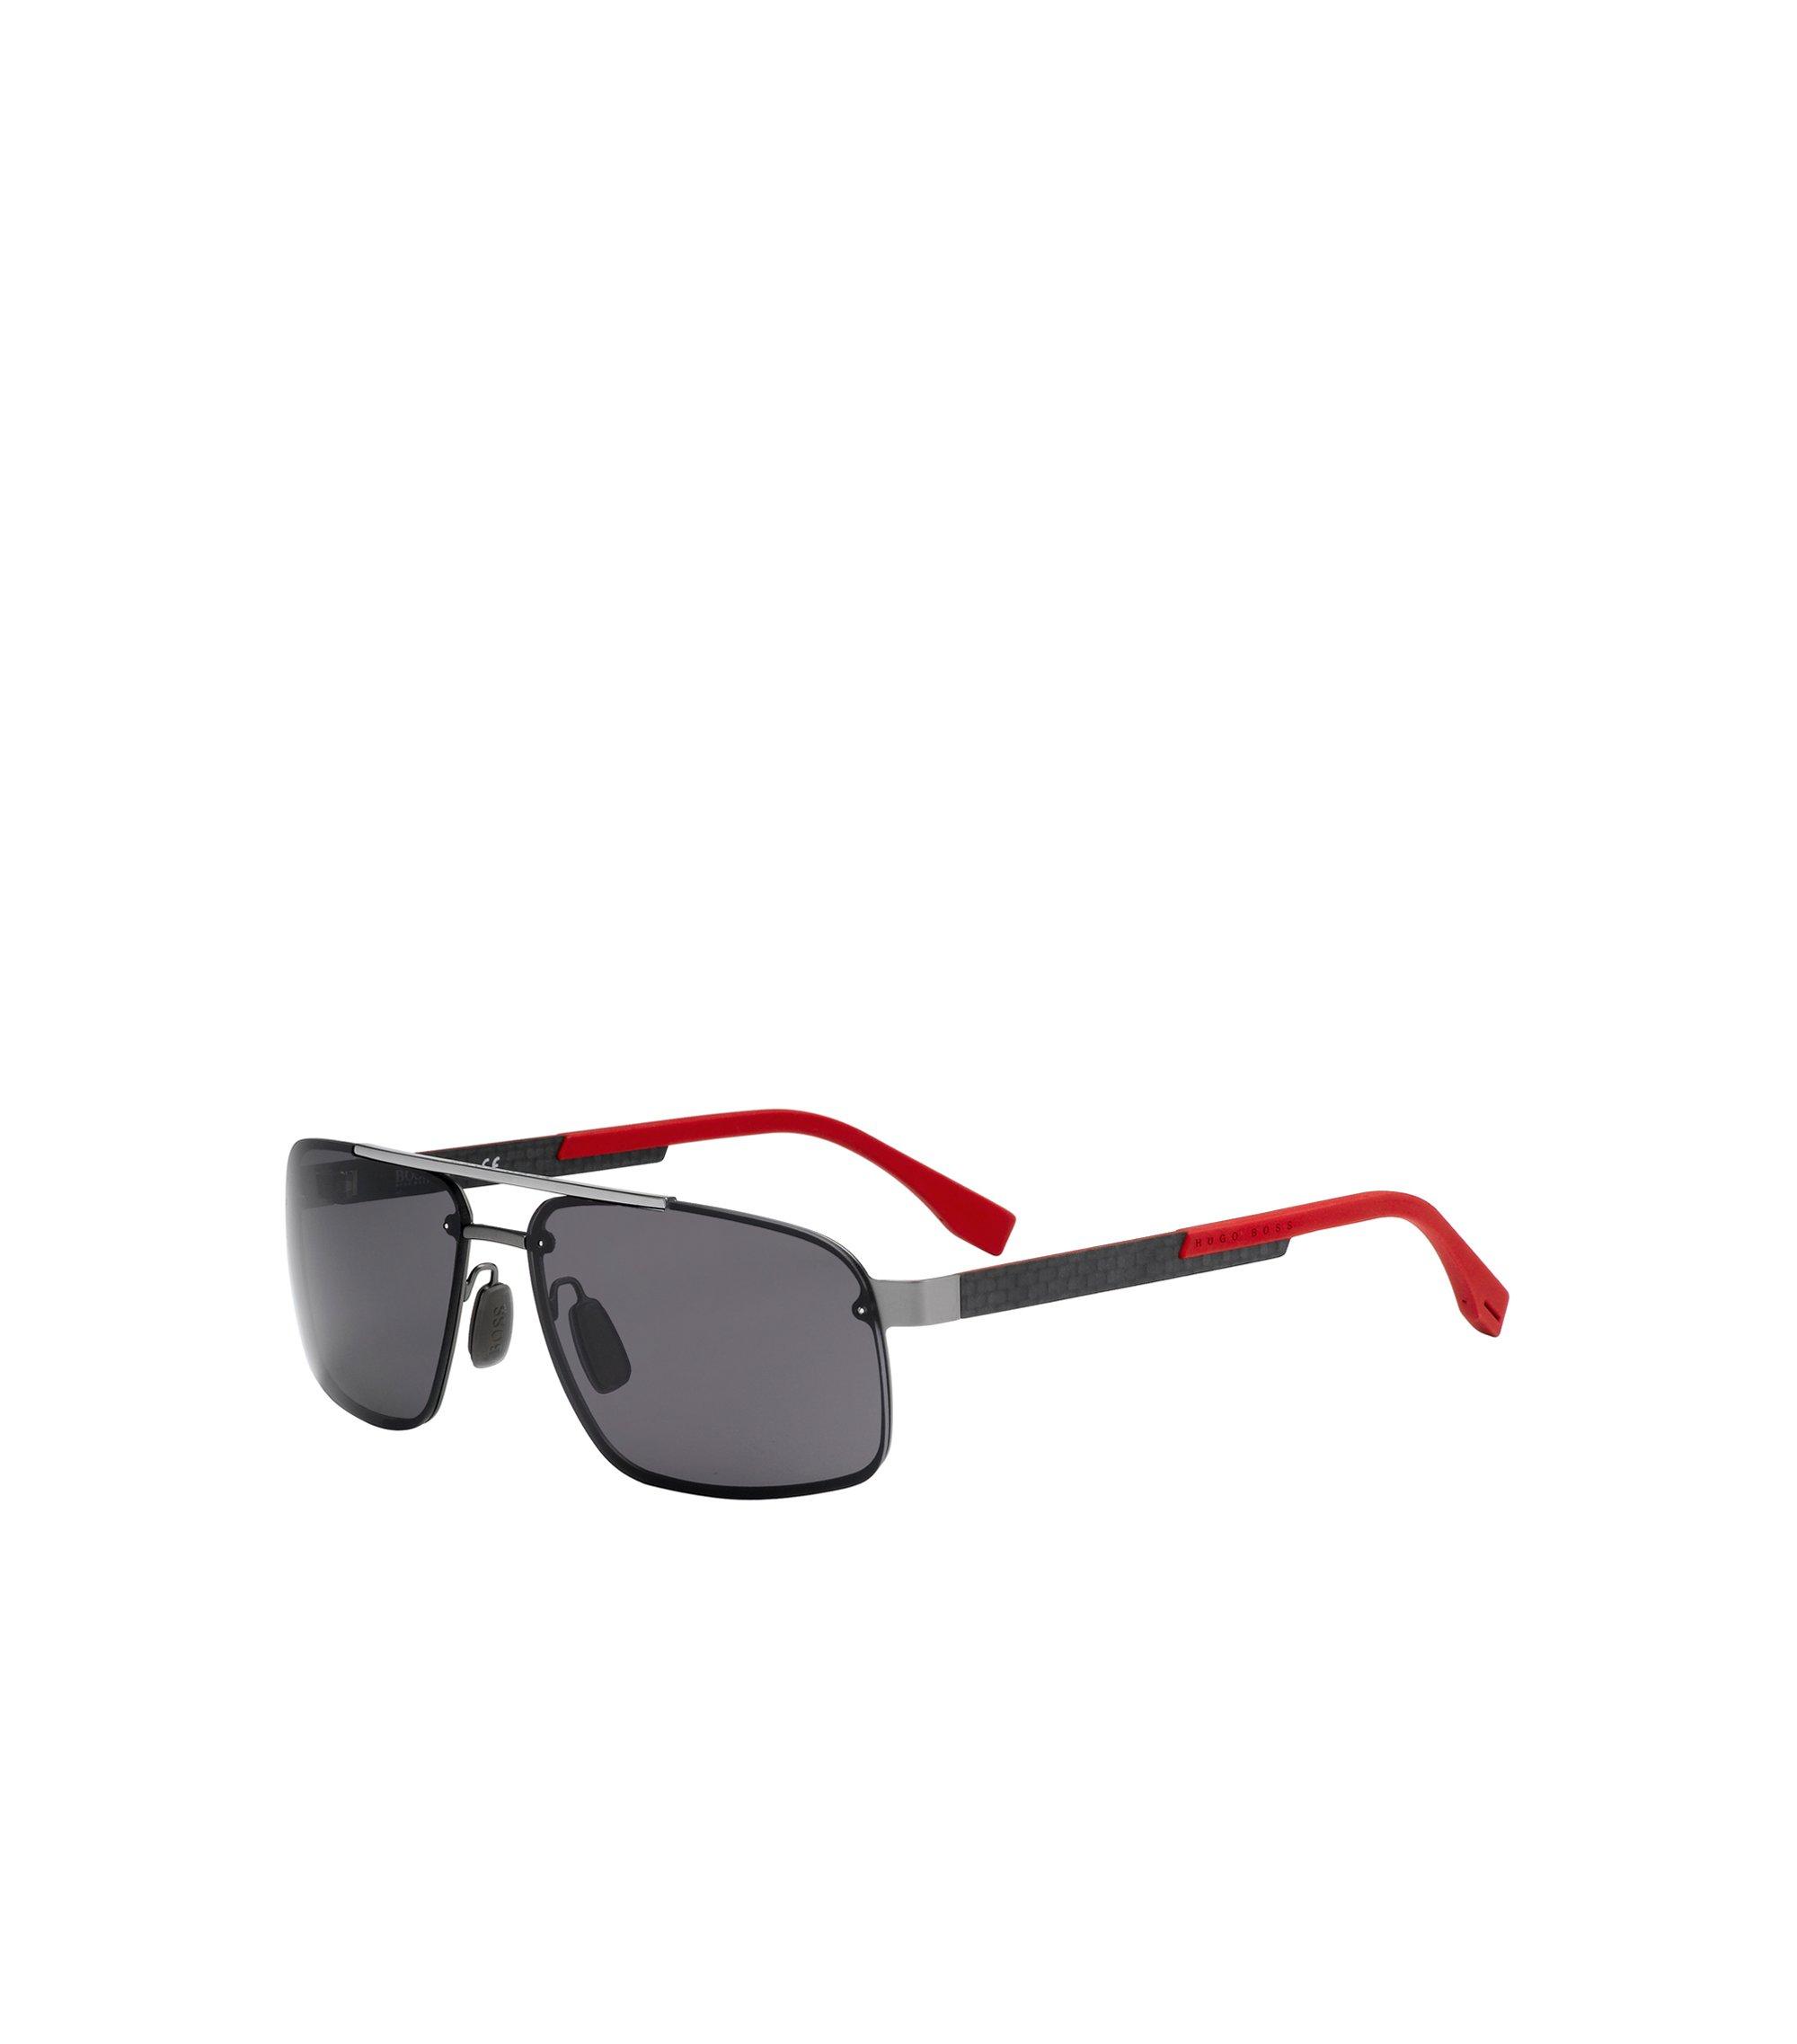 Polar Gray Lens Navigator Sunglasses | BOSS 0773, Assorted-Pre-Pack